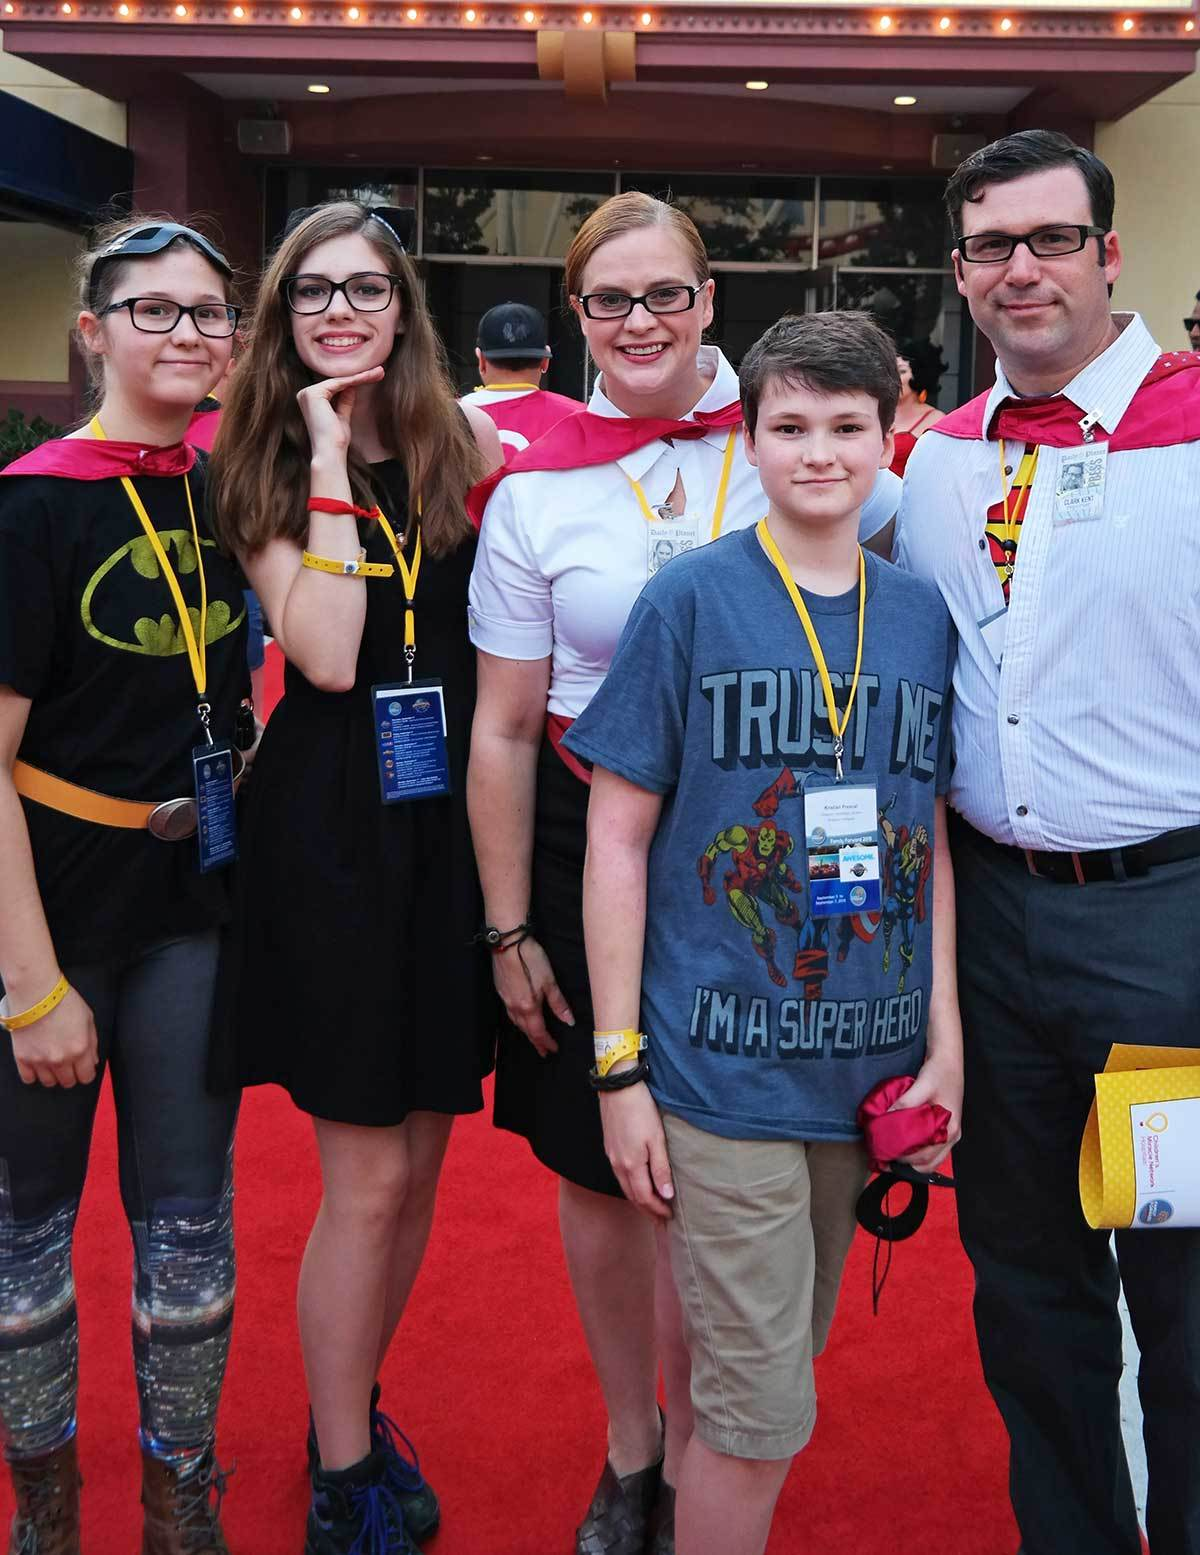 superhero-family-halloween-costume-